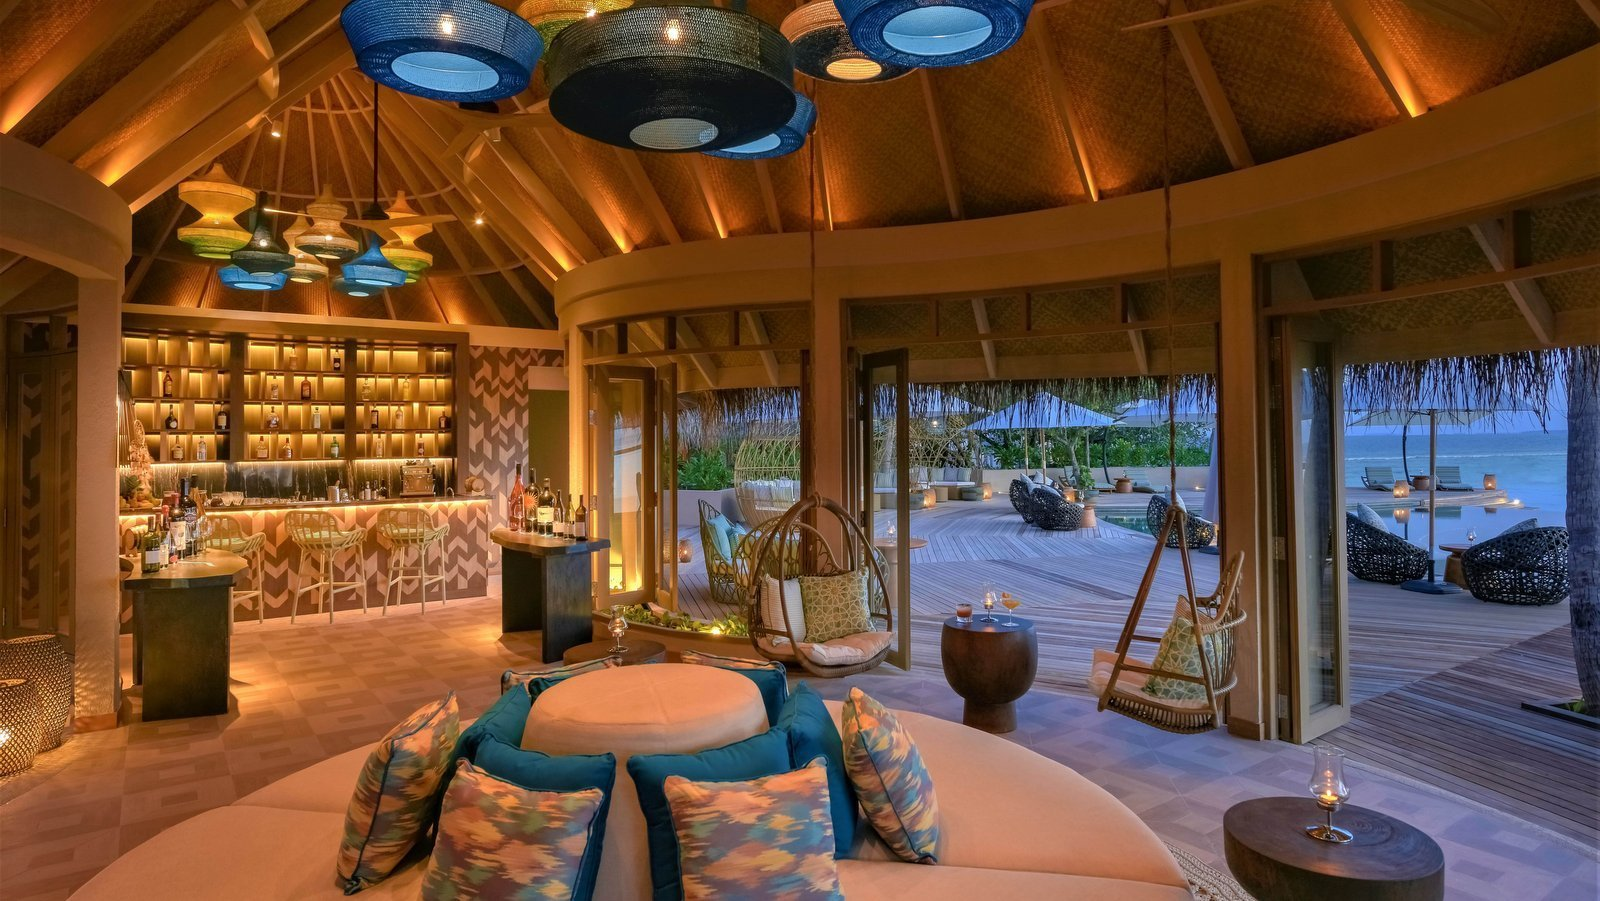 Мальдивы, отель The Nautilus Maldives, бар Naiboli